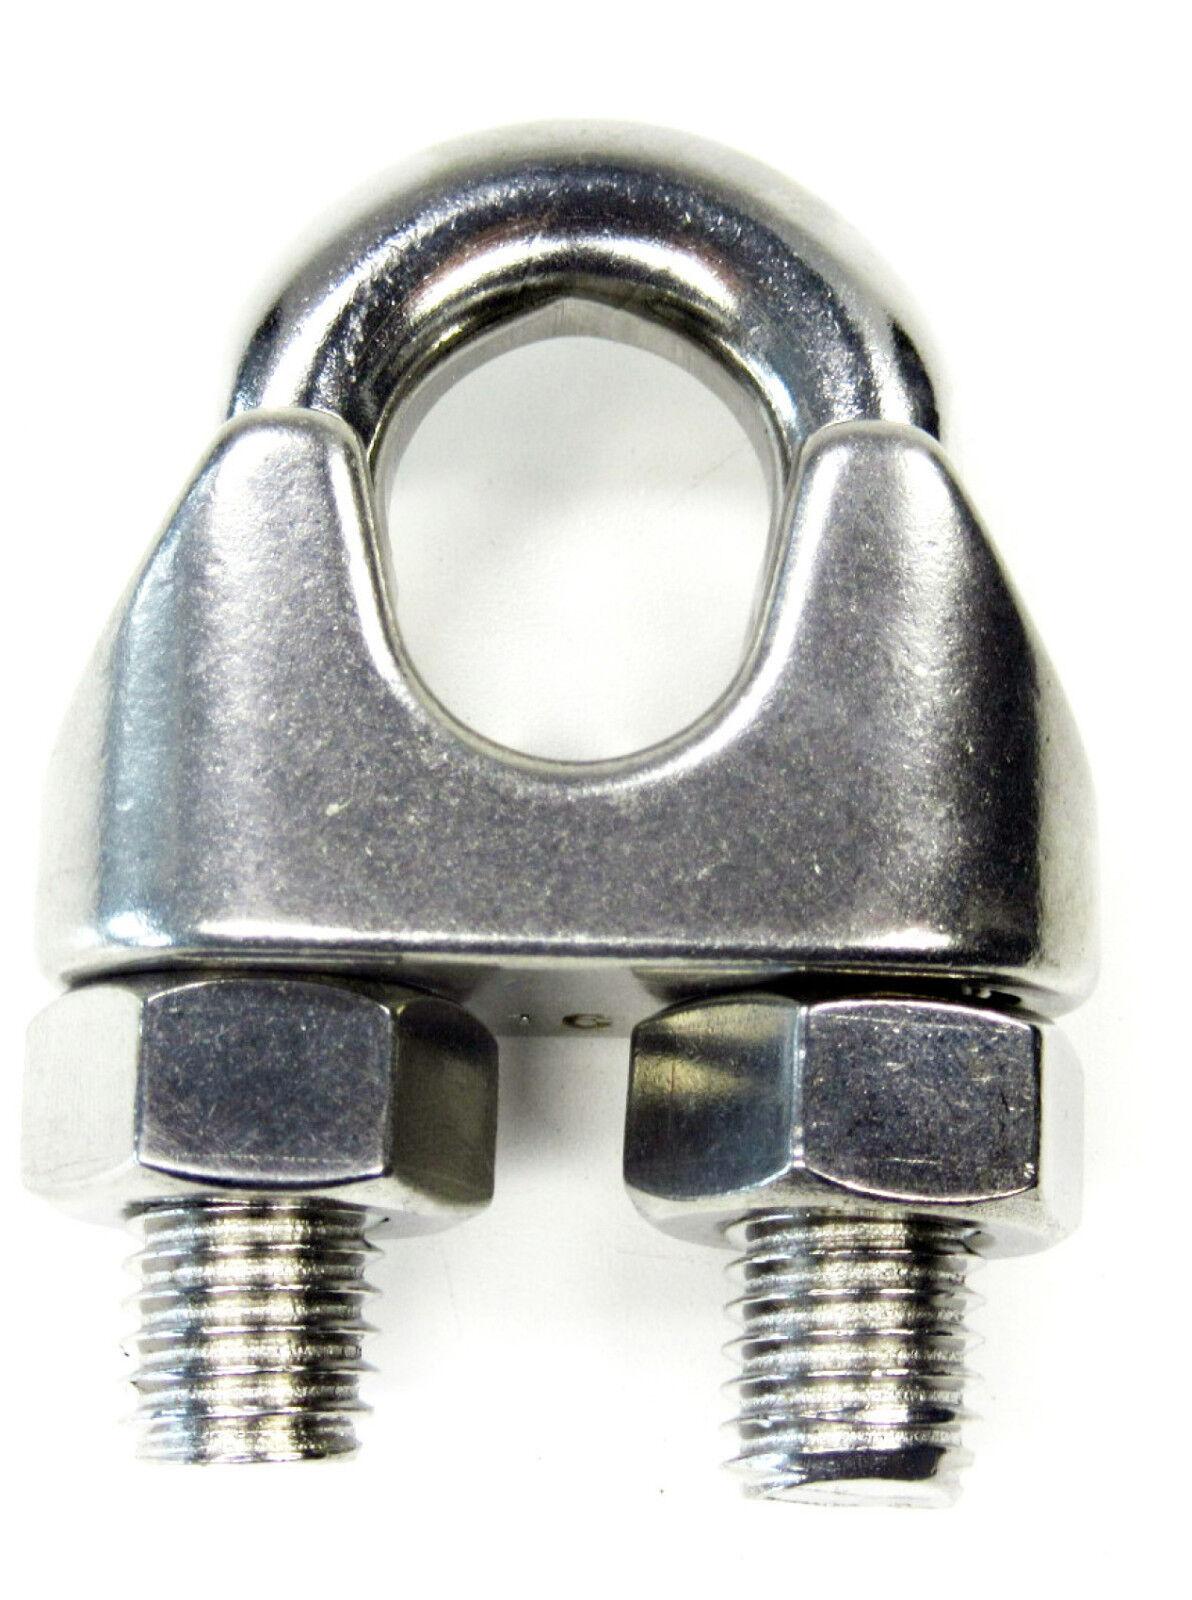 Drahtseilklemmen Drahtseilklemme Seilklemme Edelstahl 2 mm Klemm Inox (933826)